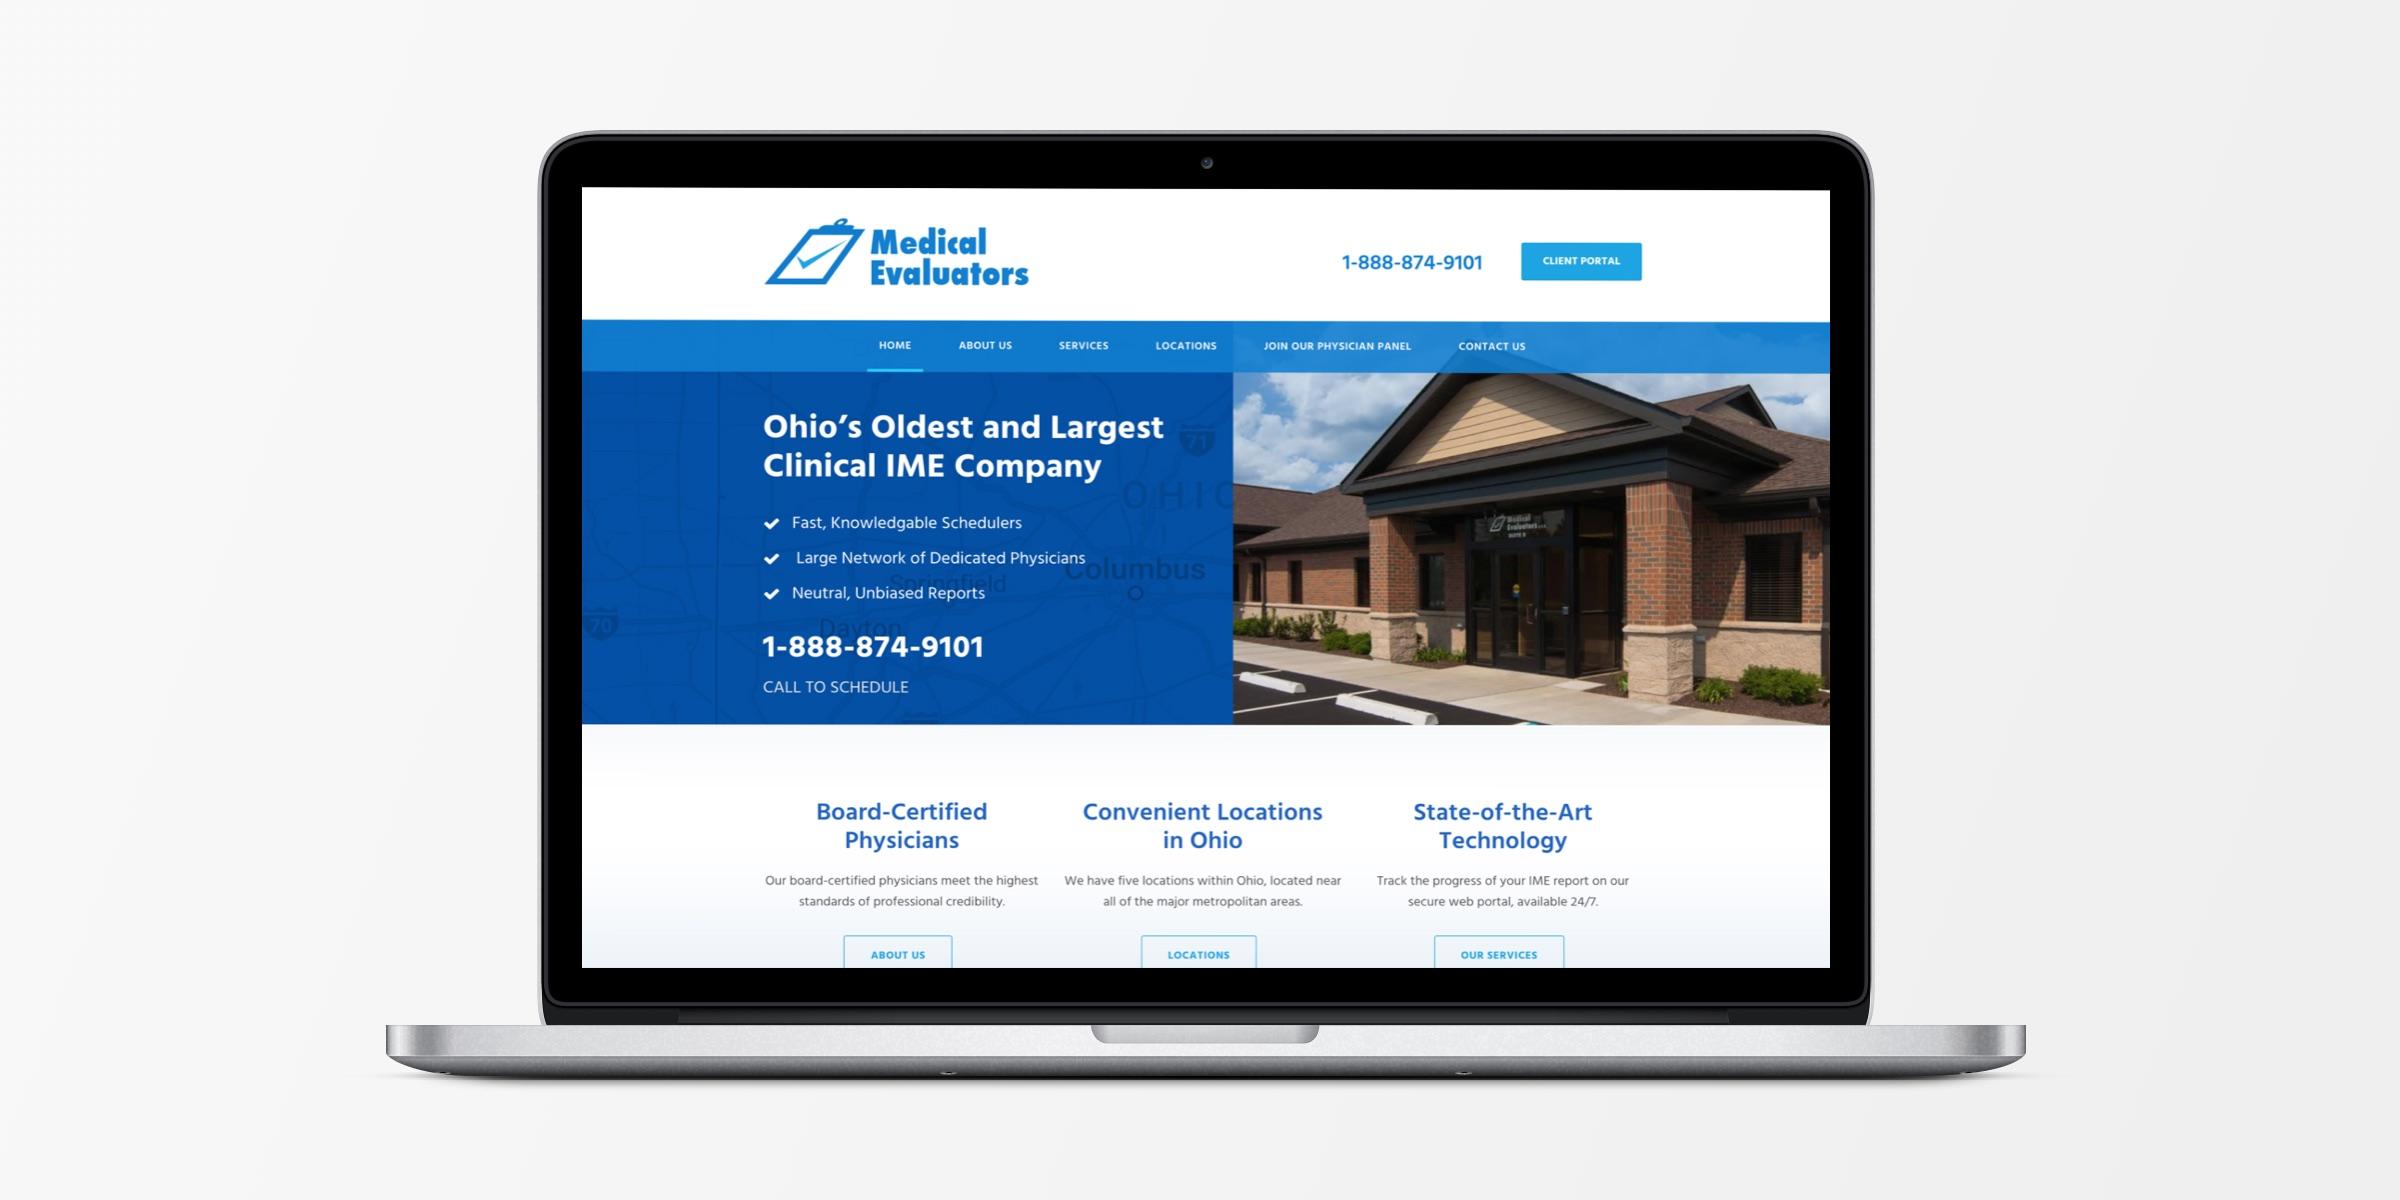 Medical Evaluators Responsive Web Design